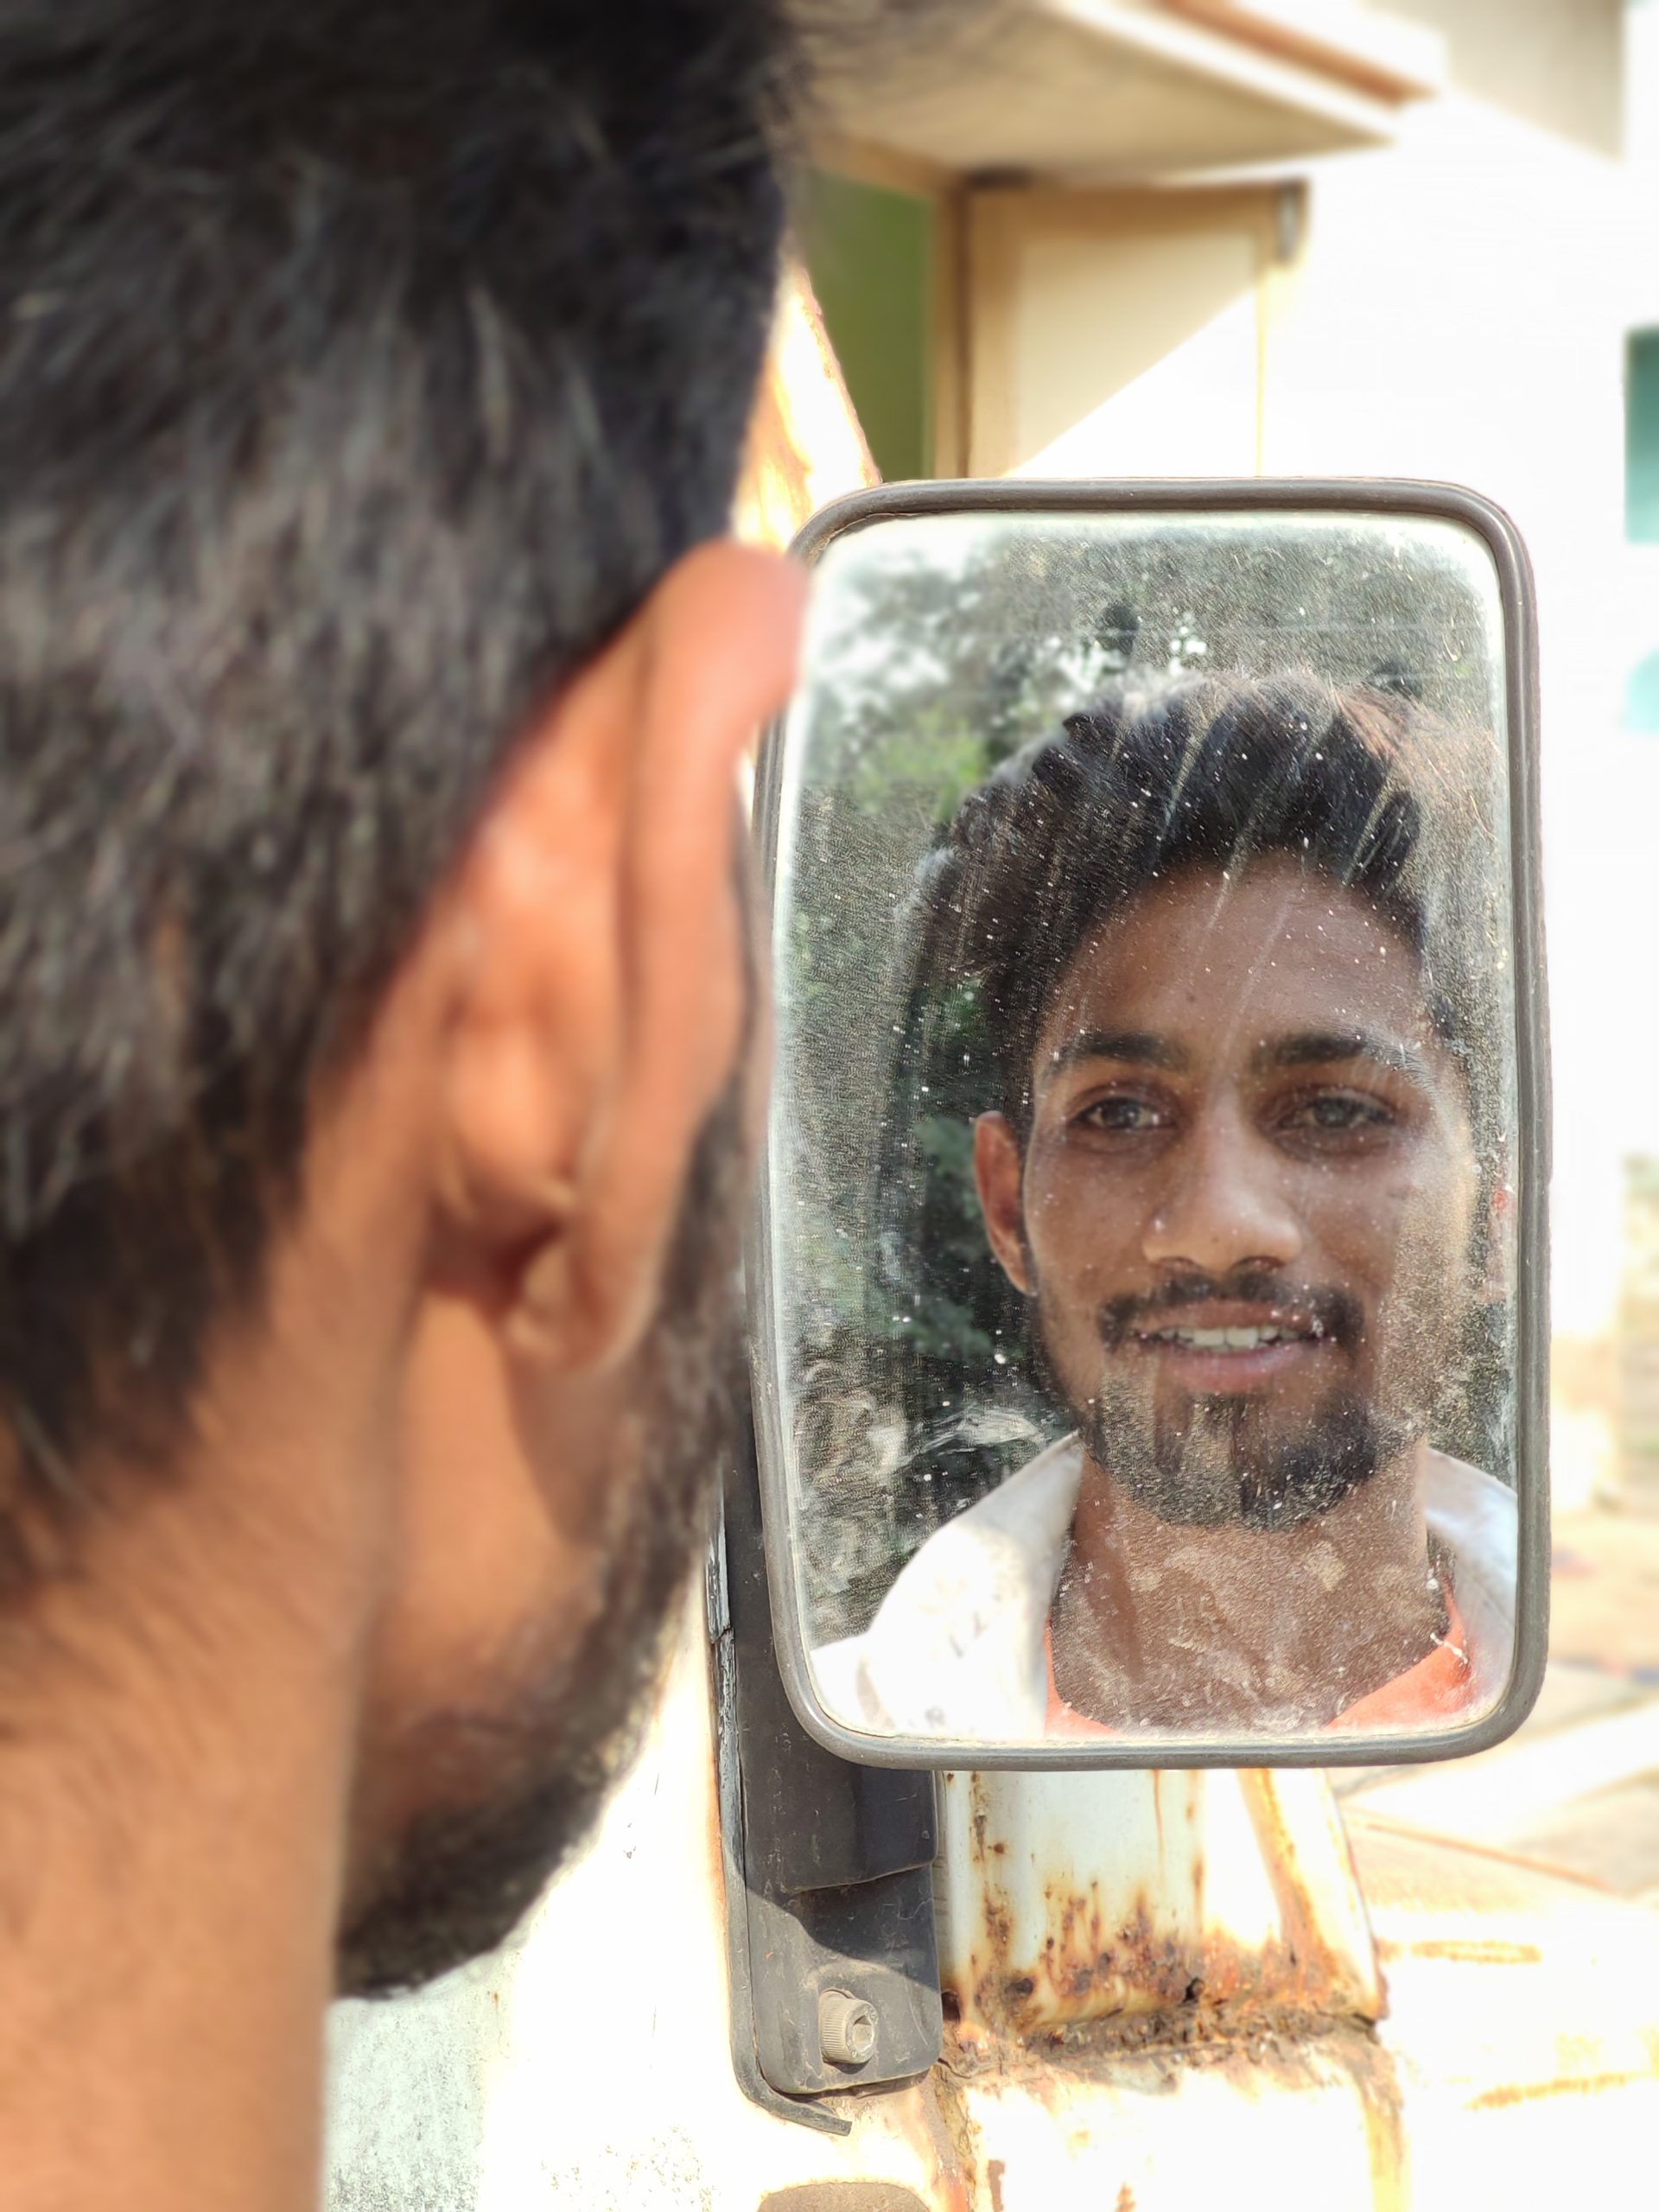 A boy watching mirror